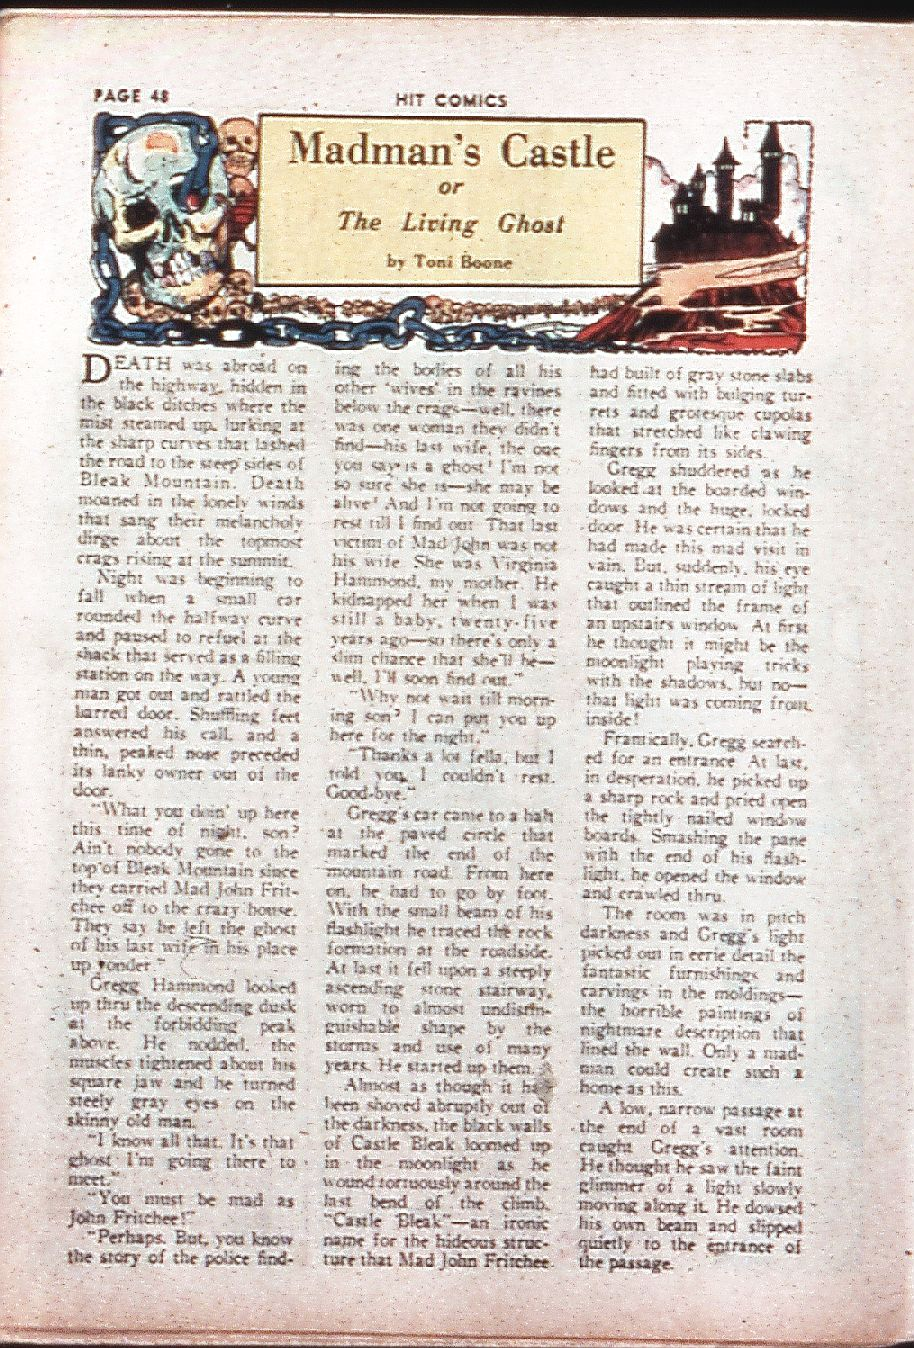 Read online Hit Comics comic -  Issue #4 - 50